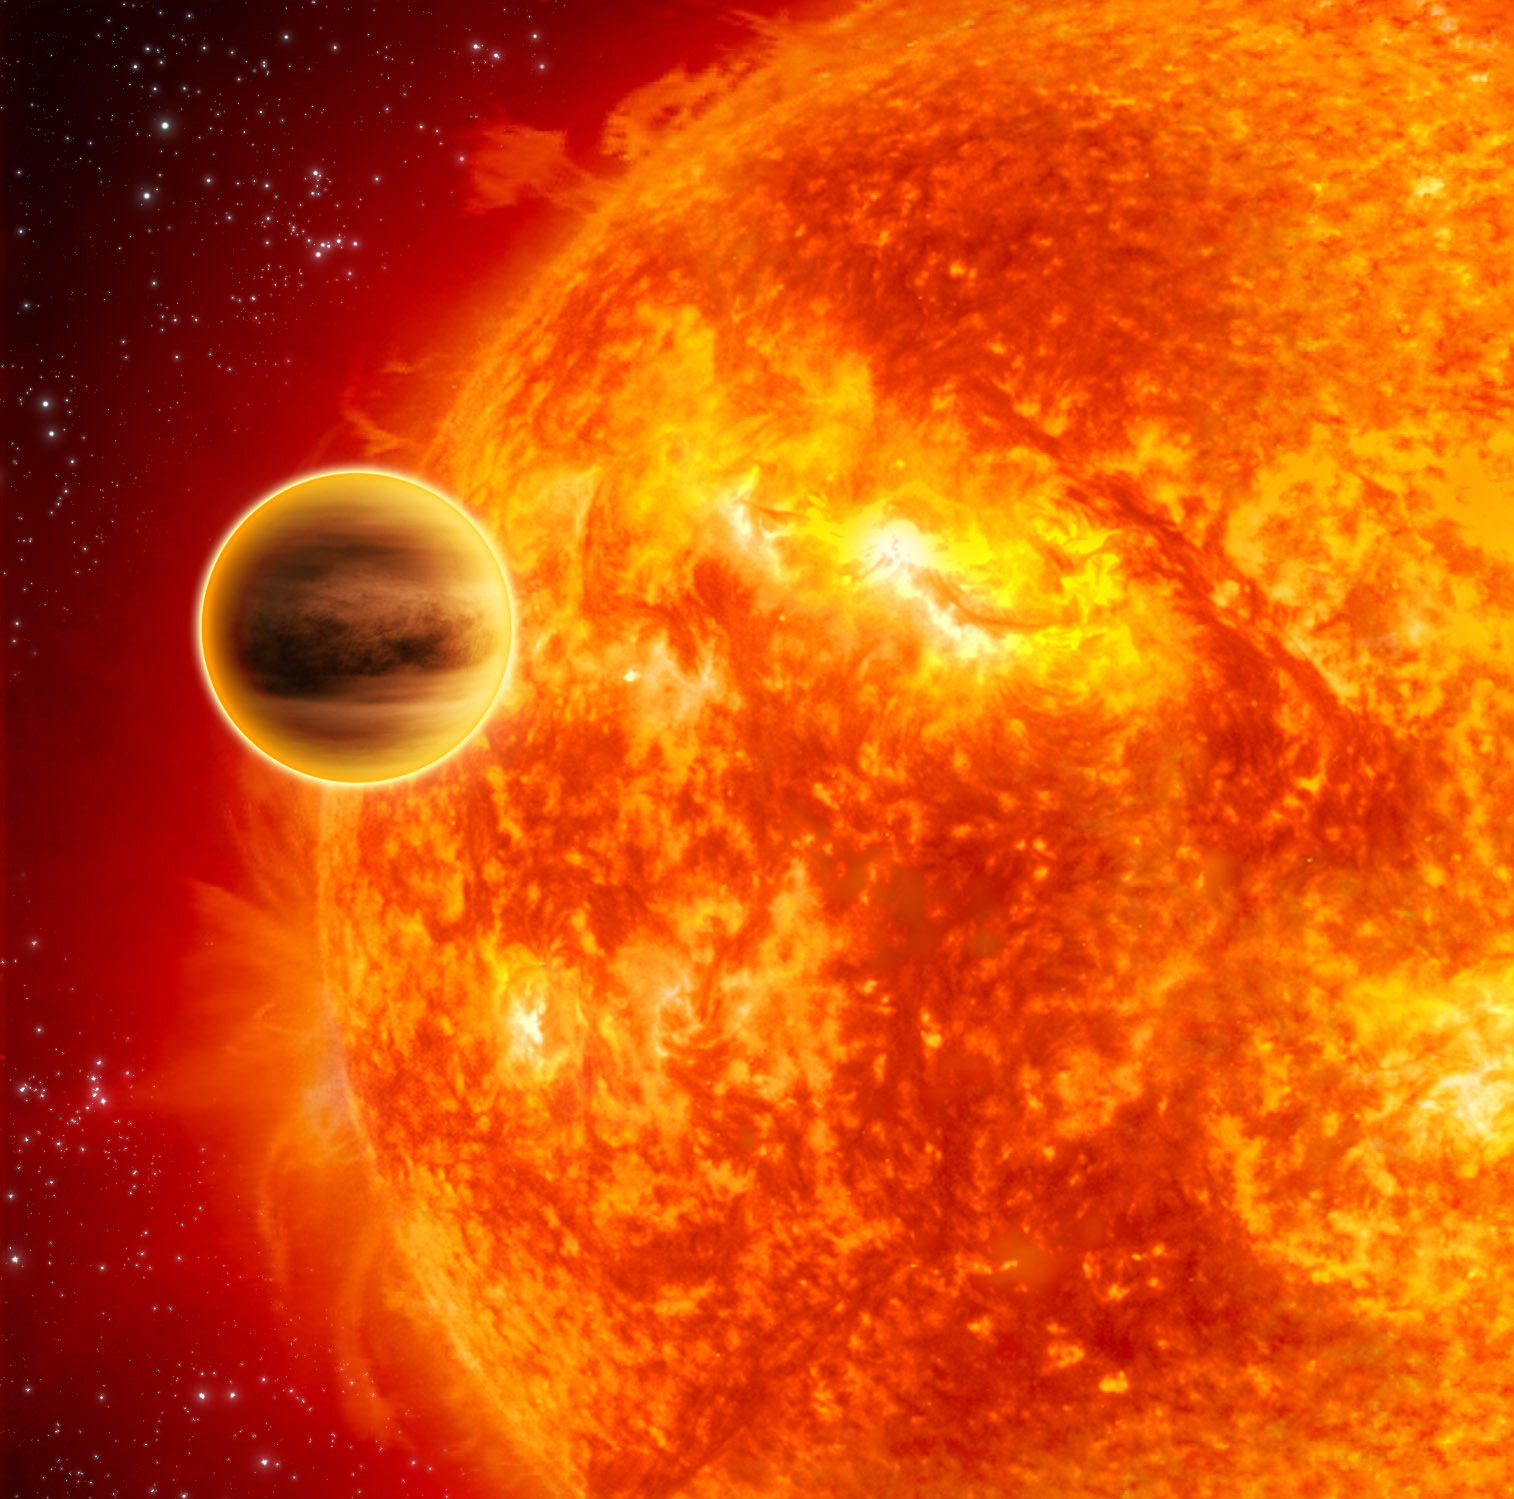 planets surrounding the sun - 847×839